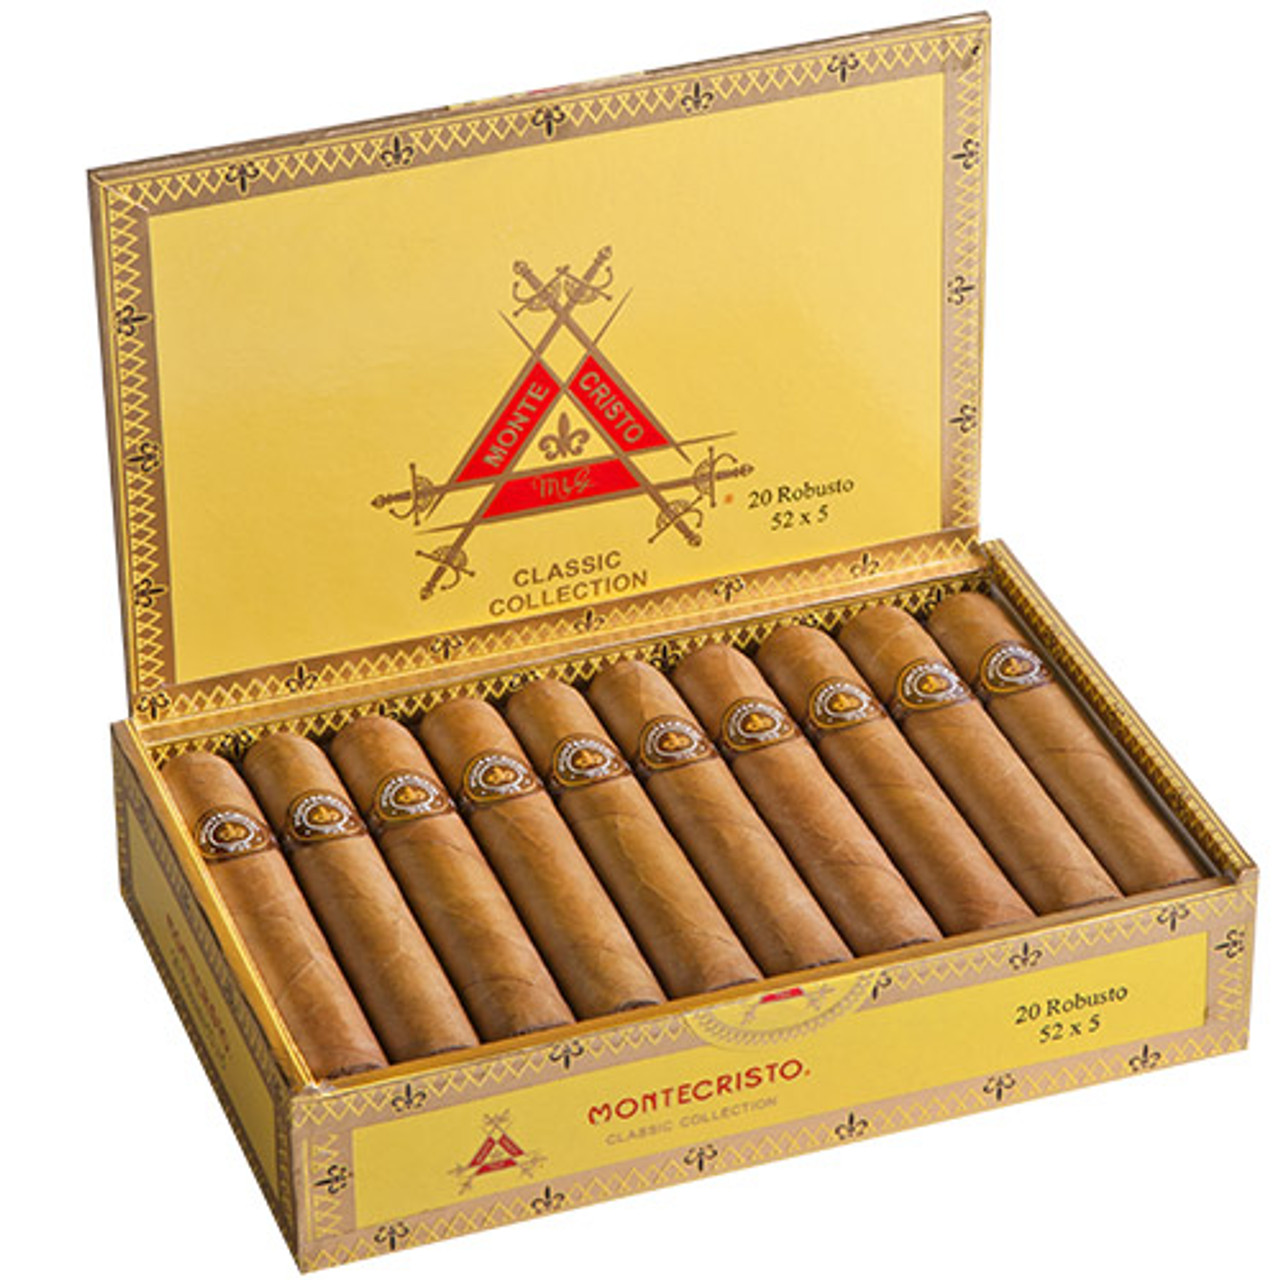 Montecristo Classic Toro Cigars - 6 x 52 (Box of 20)